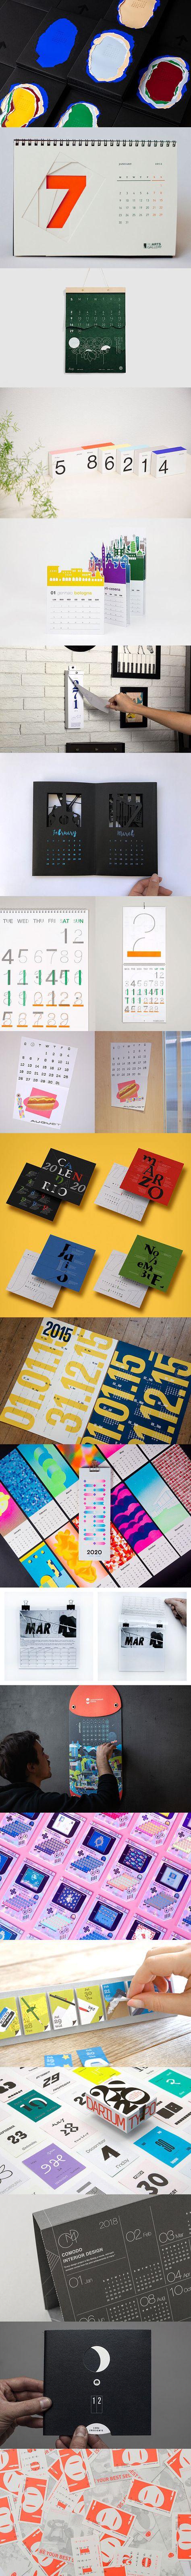 25 Creative Calendar Design Ideas for 2020